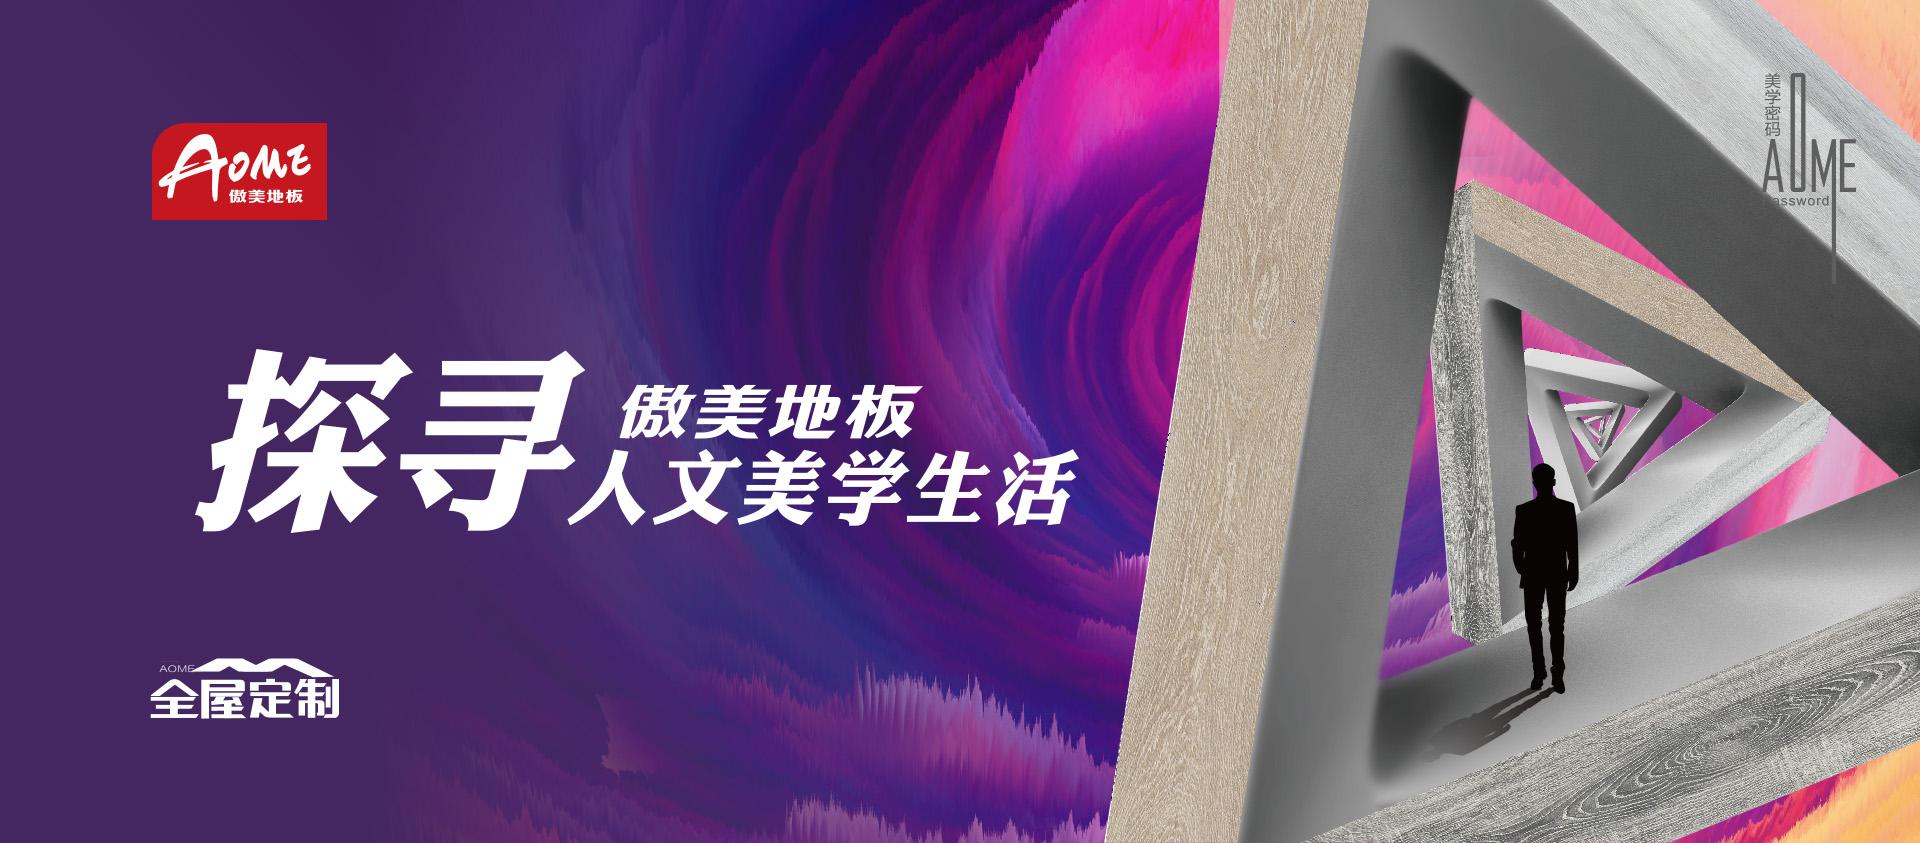 PC-banner2